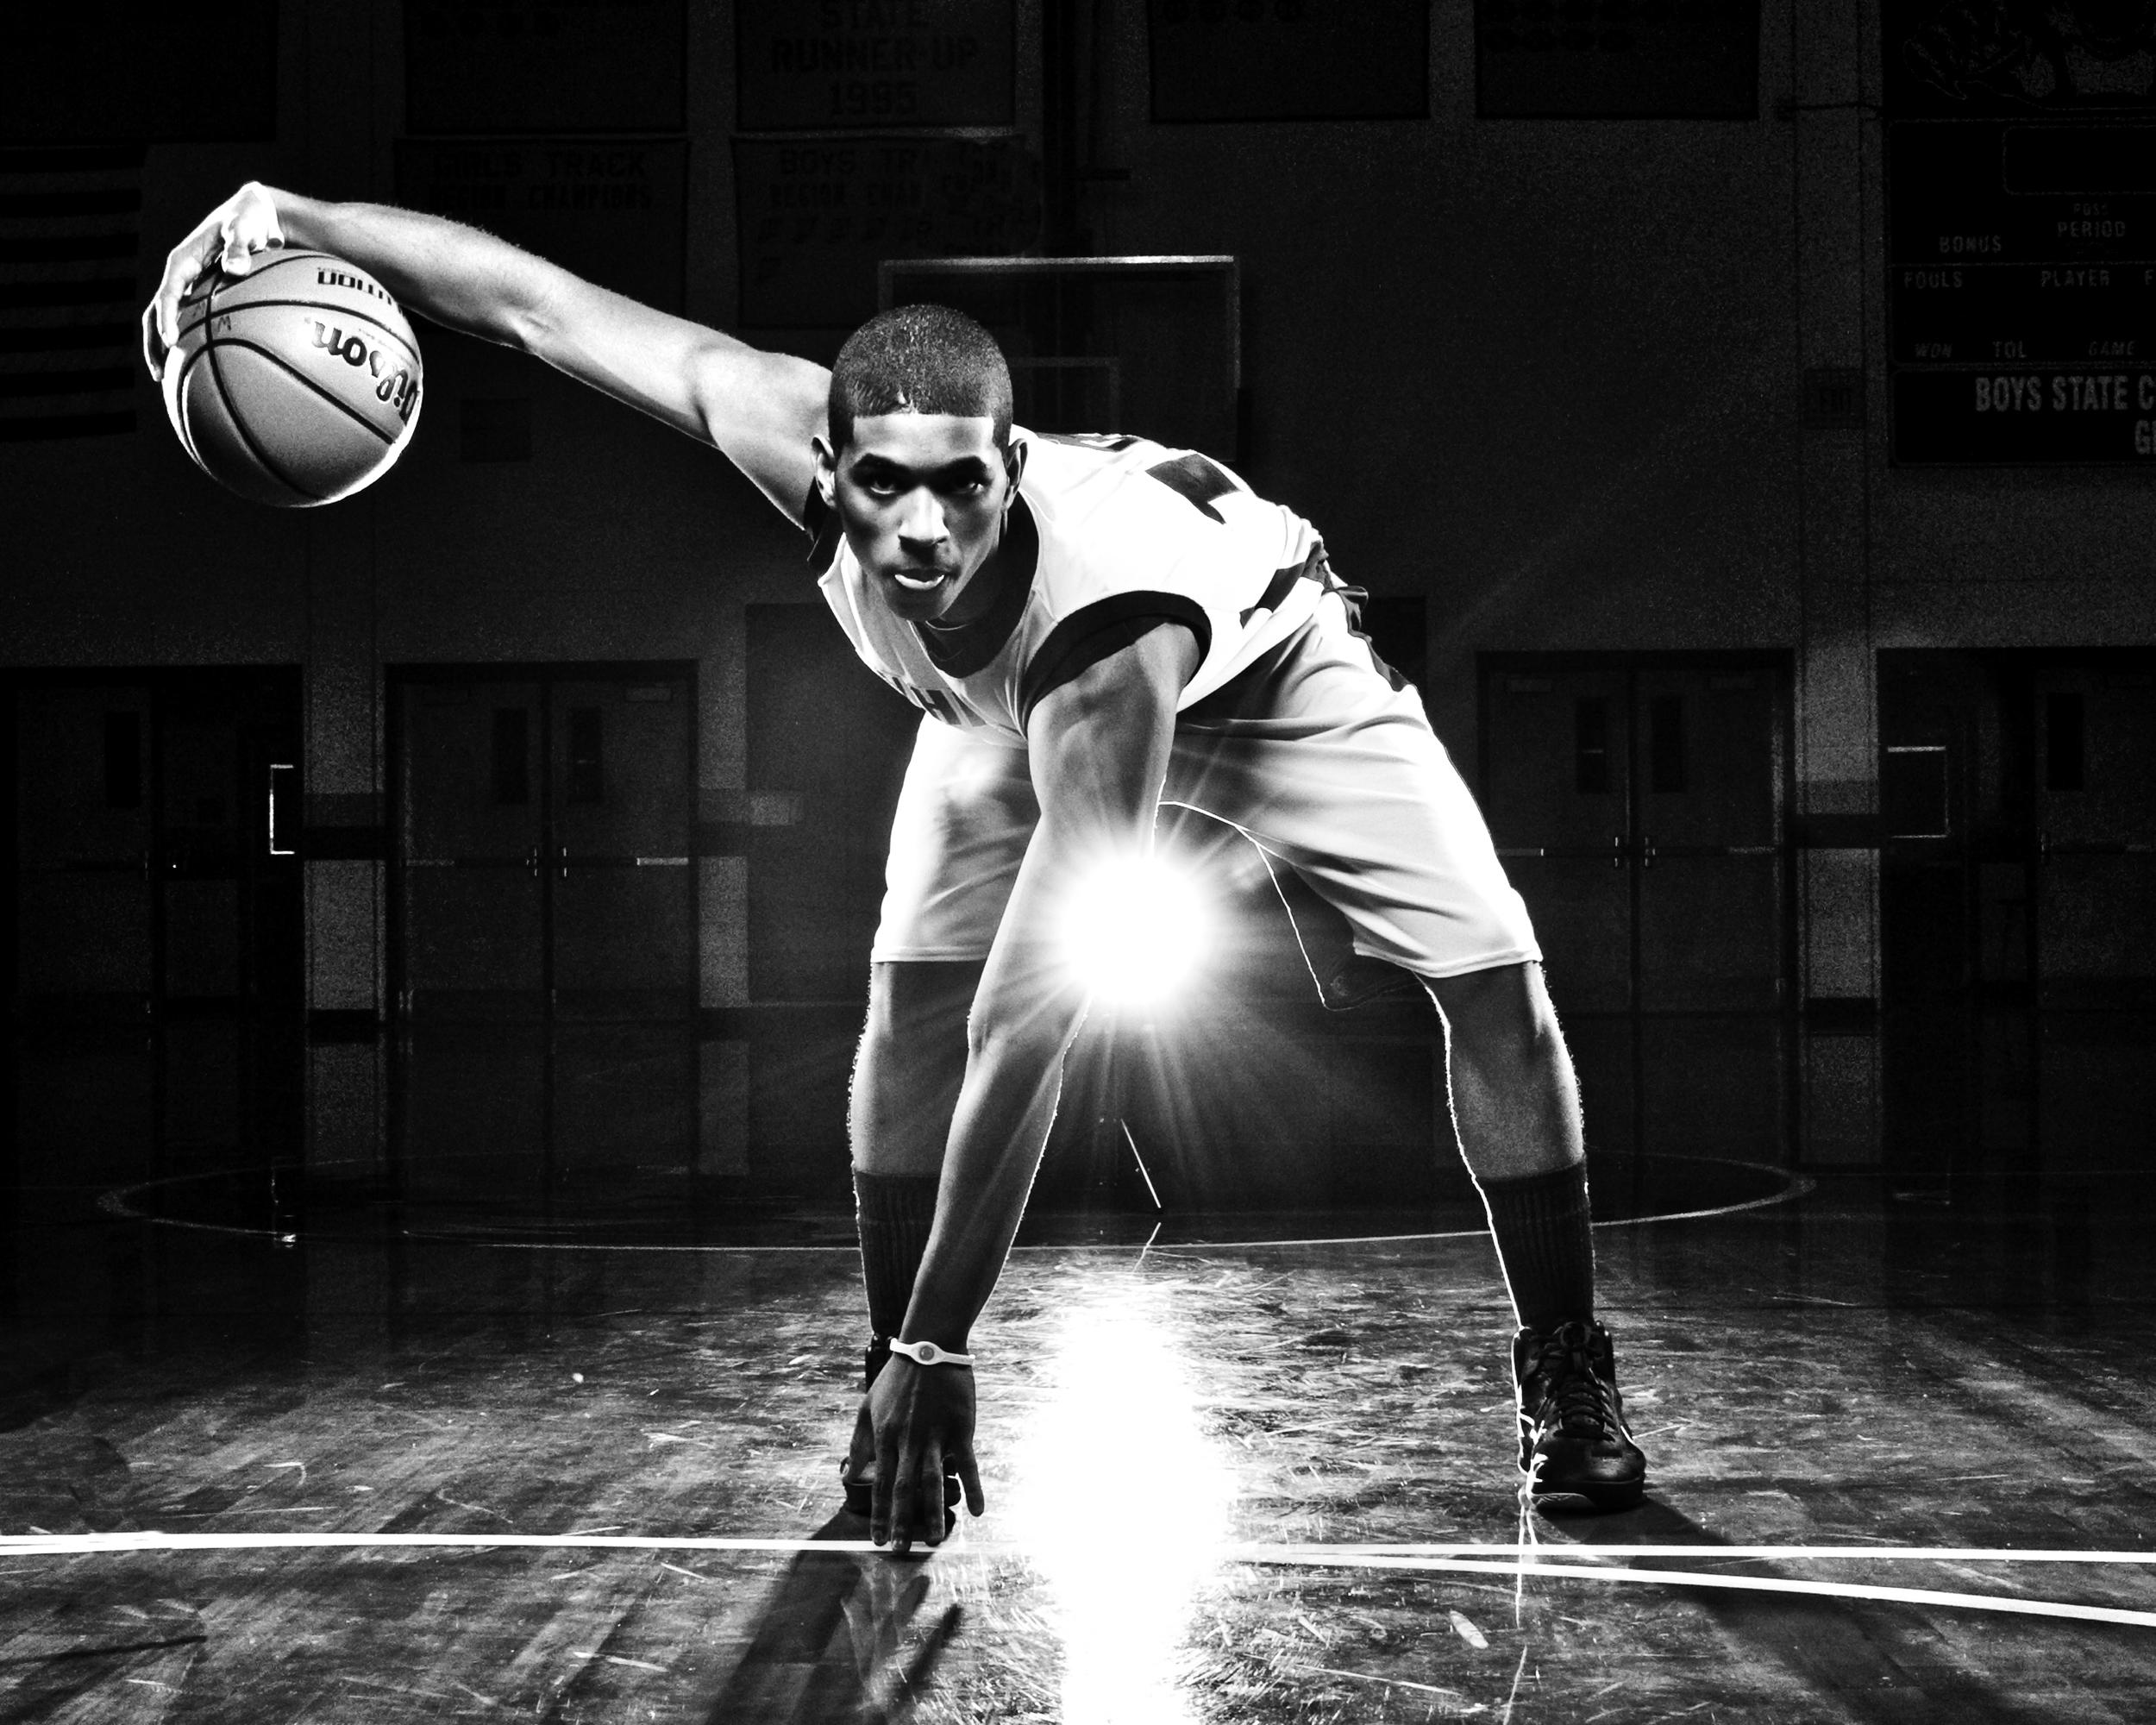 cb_playerspotlight_0111_kksimmons_basketball4.jpg